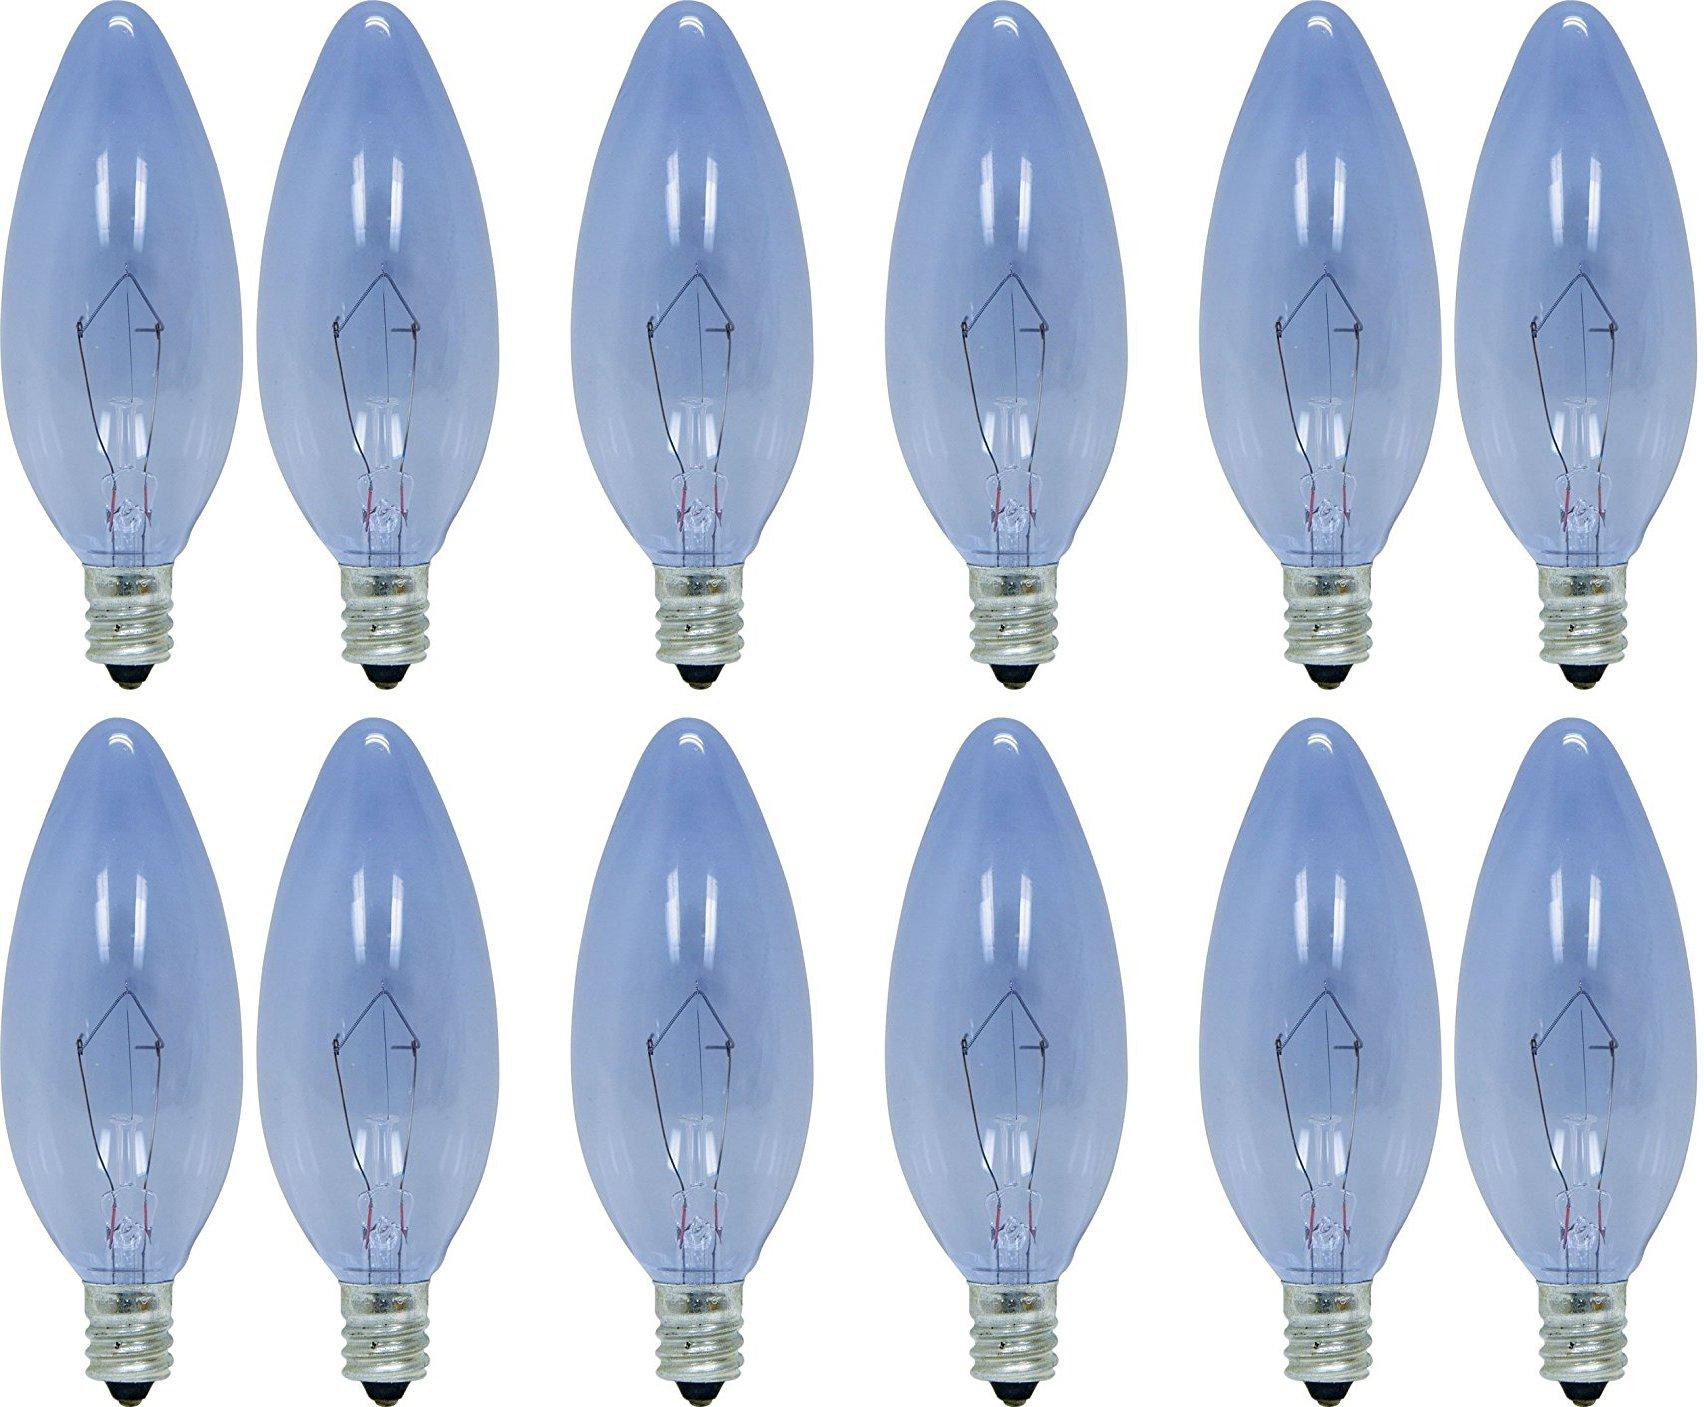 GE Lighting 75201 60-Watt 455-Lumen Blunt Tip Light Bulb with Candelabra Base, 12-Pack